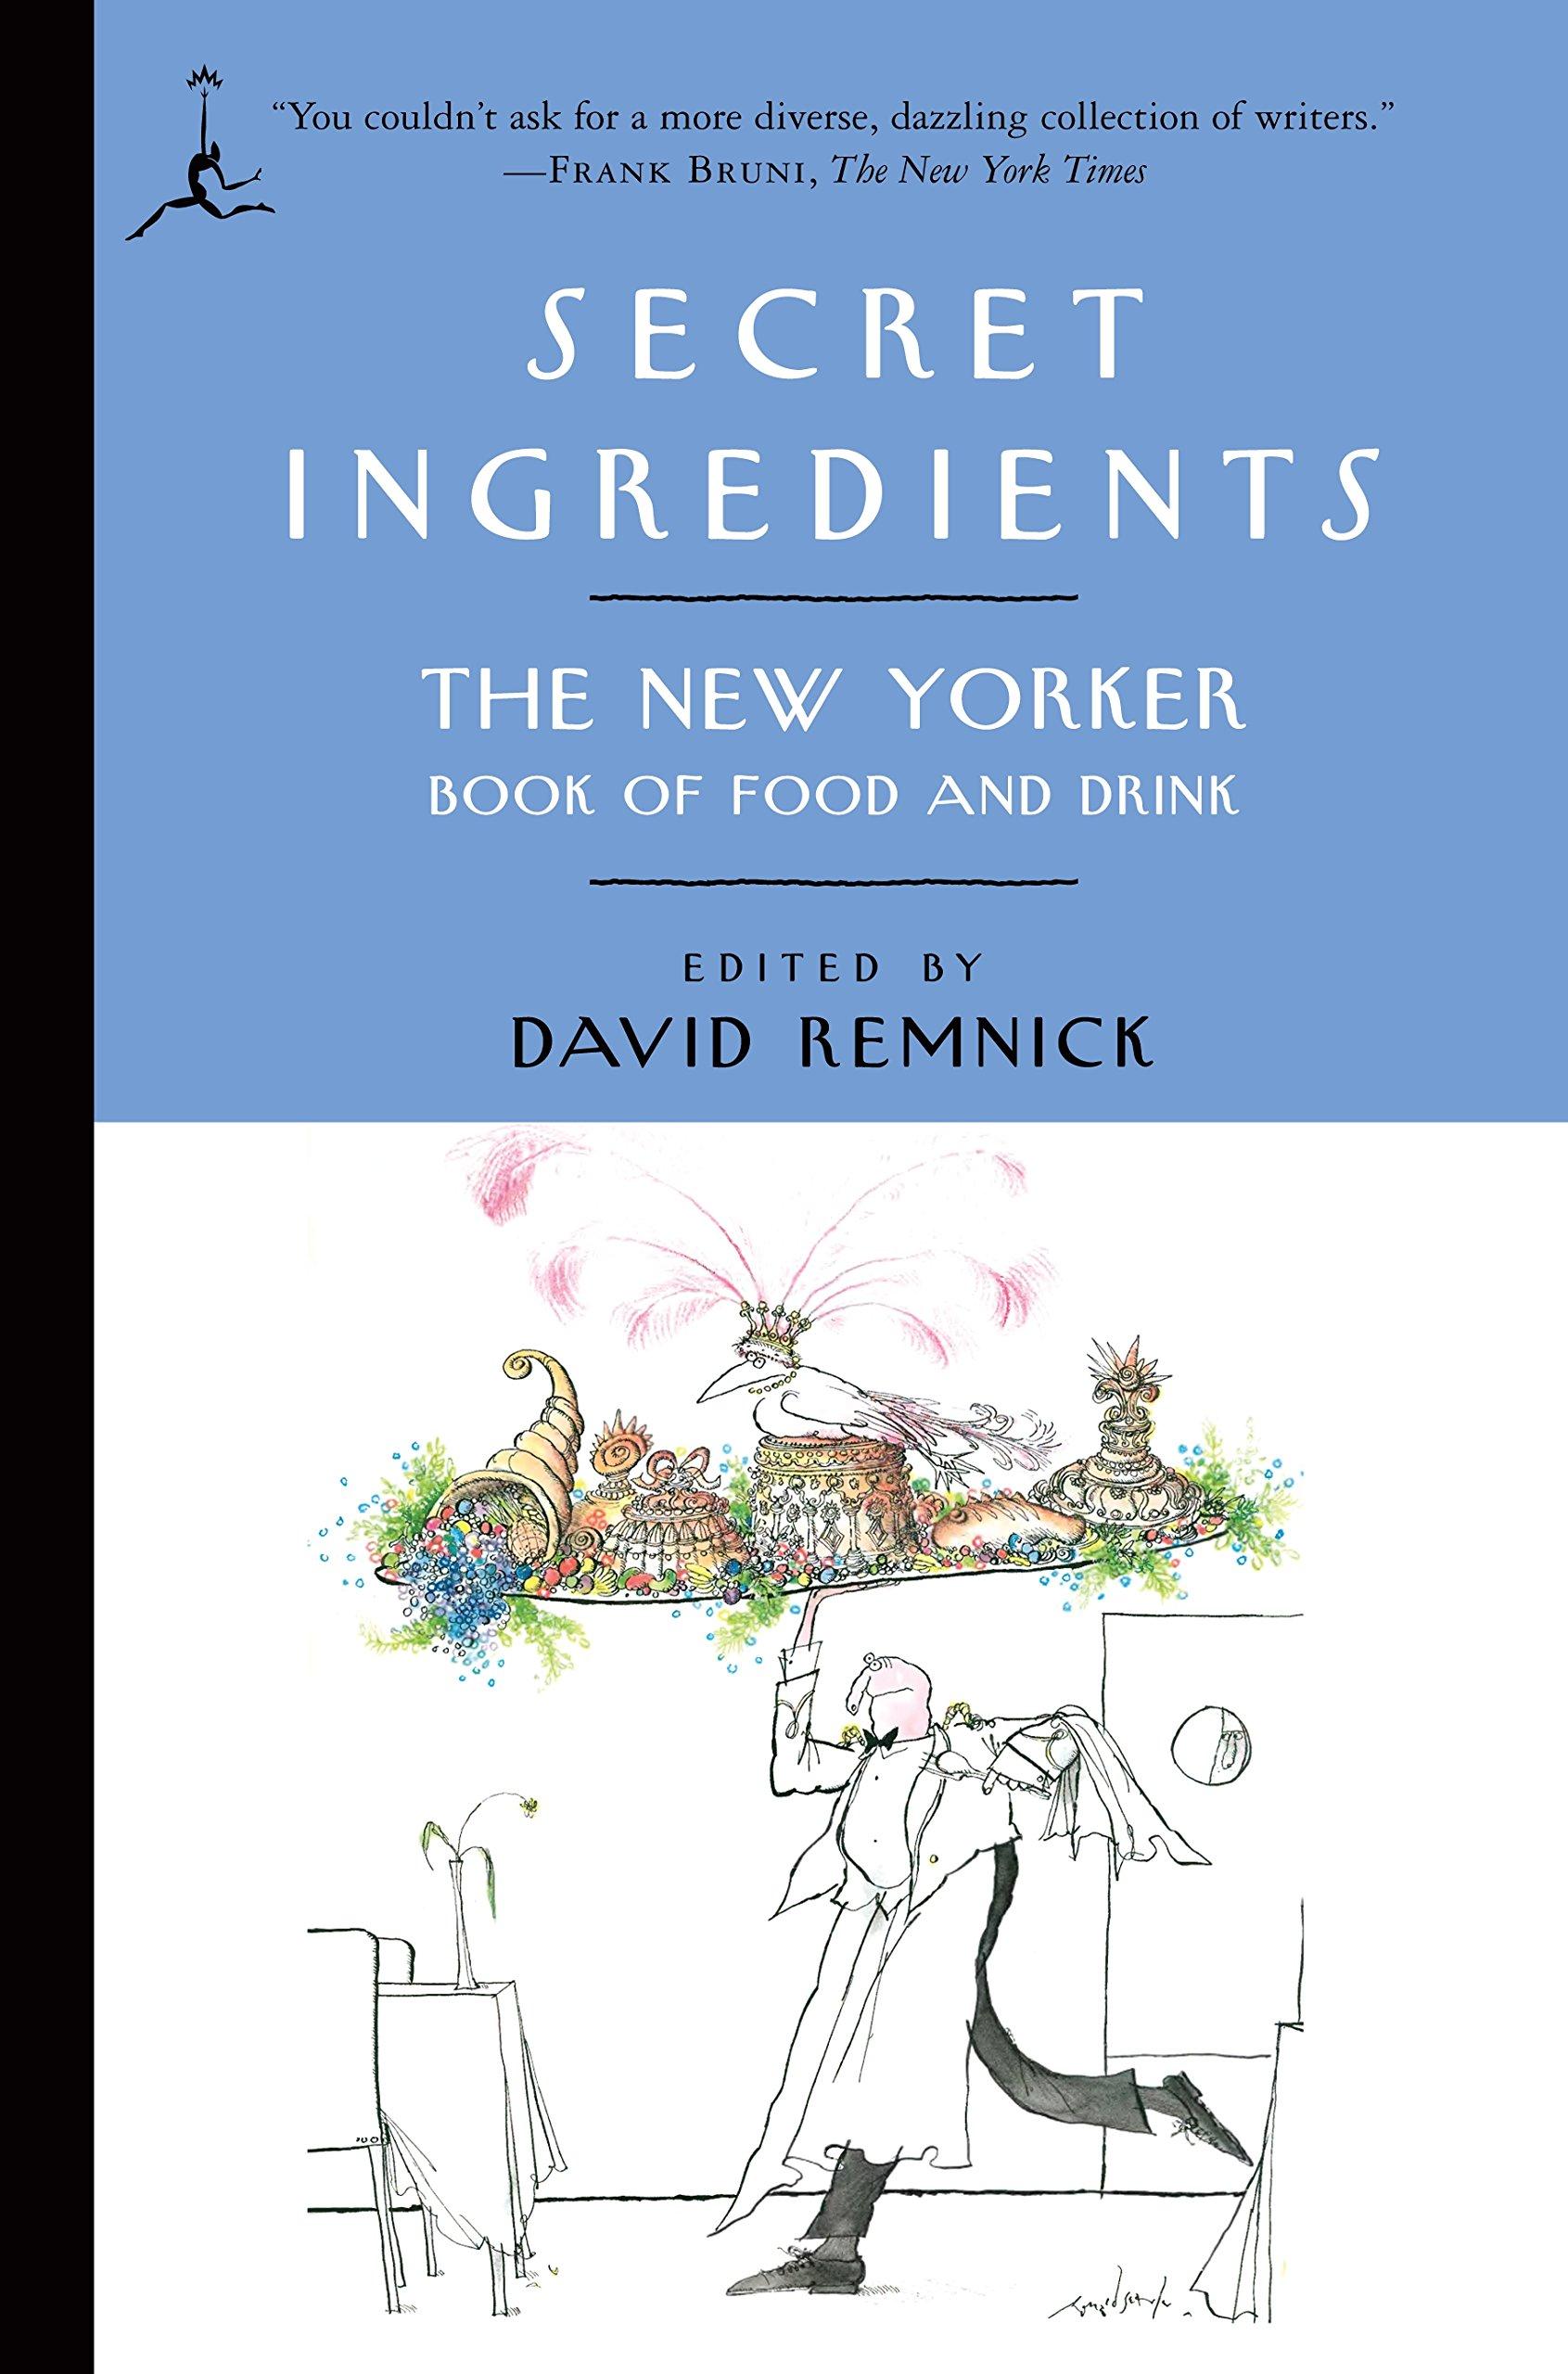 Secret ingredients the new yorker book of food and drink modern secret ingredients the new yorker book of food and drink modern library paperbacks david remnick 9780812976410 amazon books fandeluxe Epub